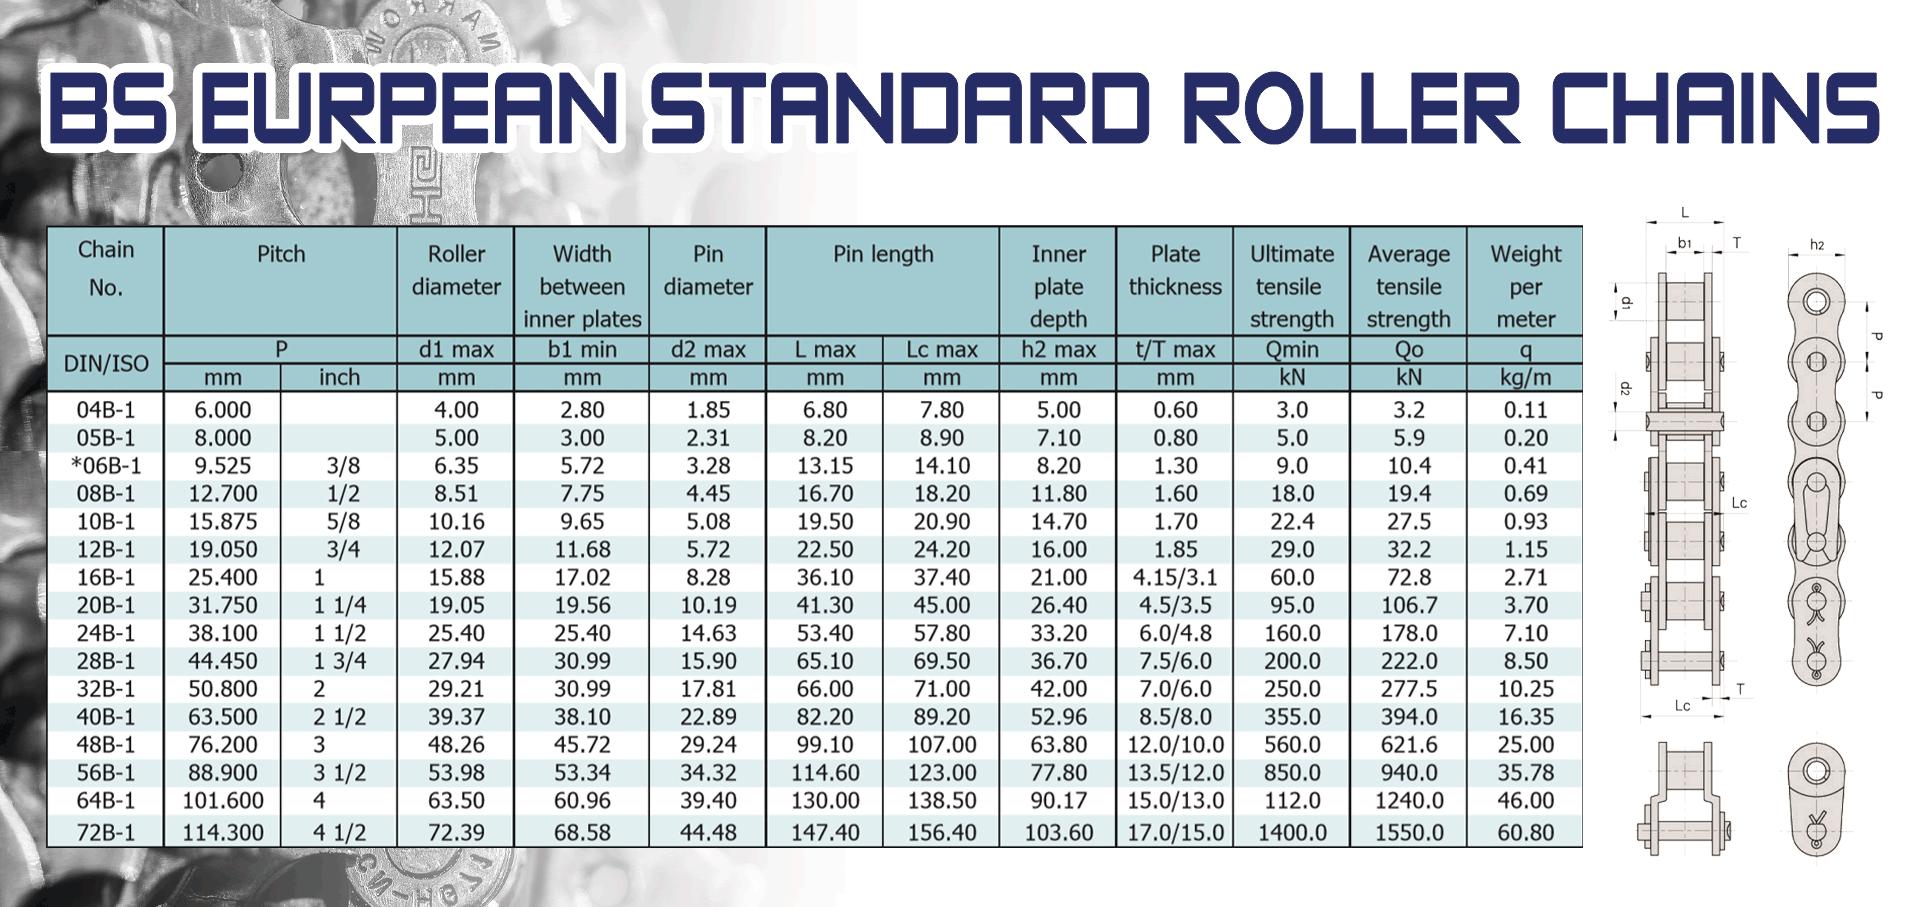 BS Eurpean Standard Roller Chains โซ่ขับมาตรฐานยุโรป